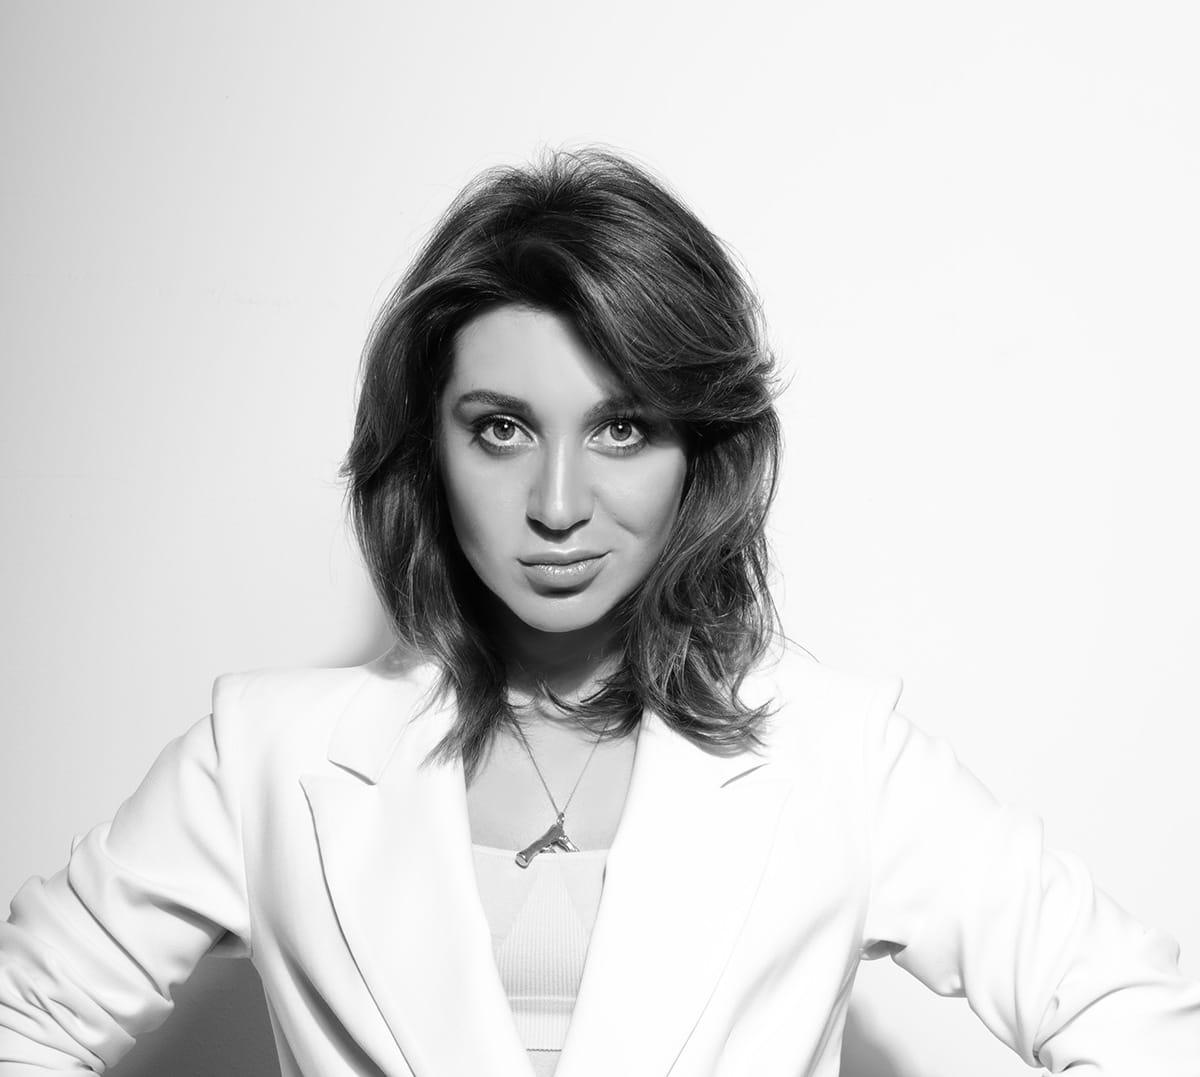 Лаура Коренева, создатель Beauty Bistro: о бизнесе, брендах и красоте.